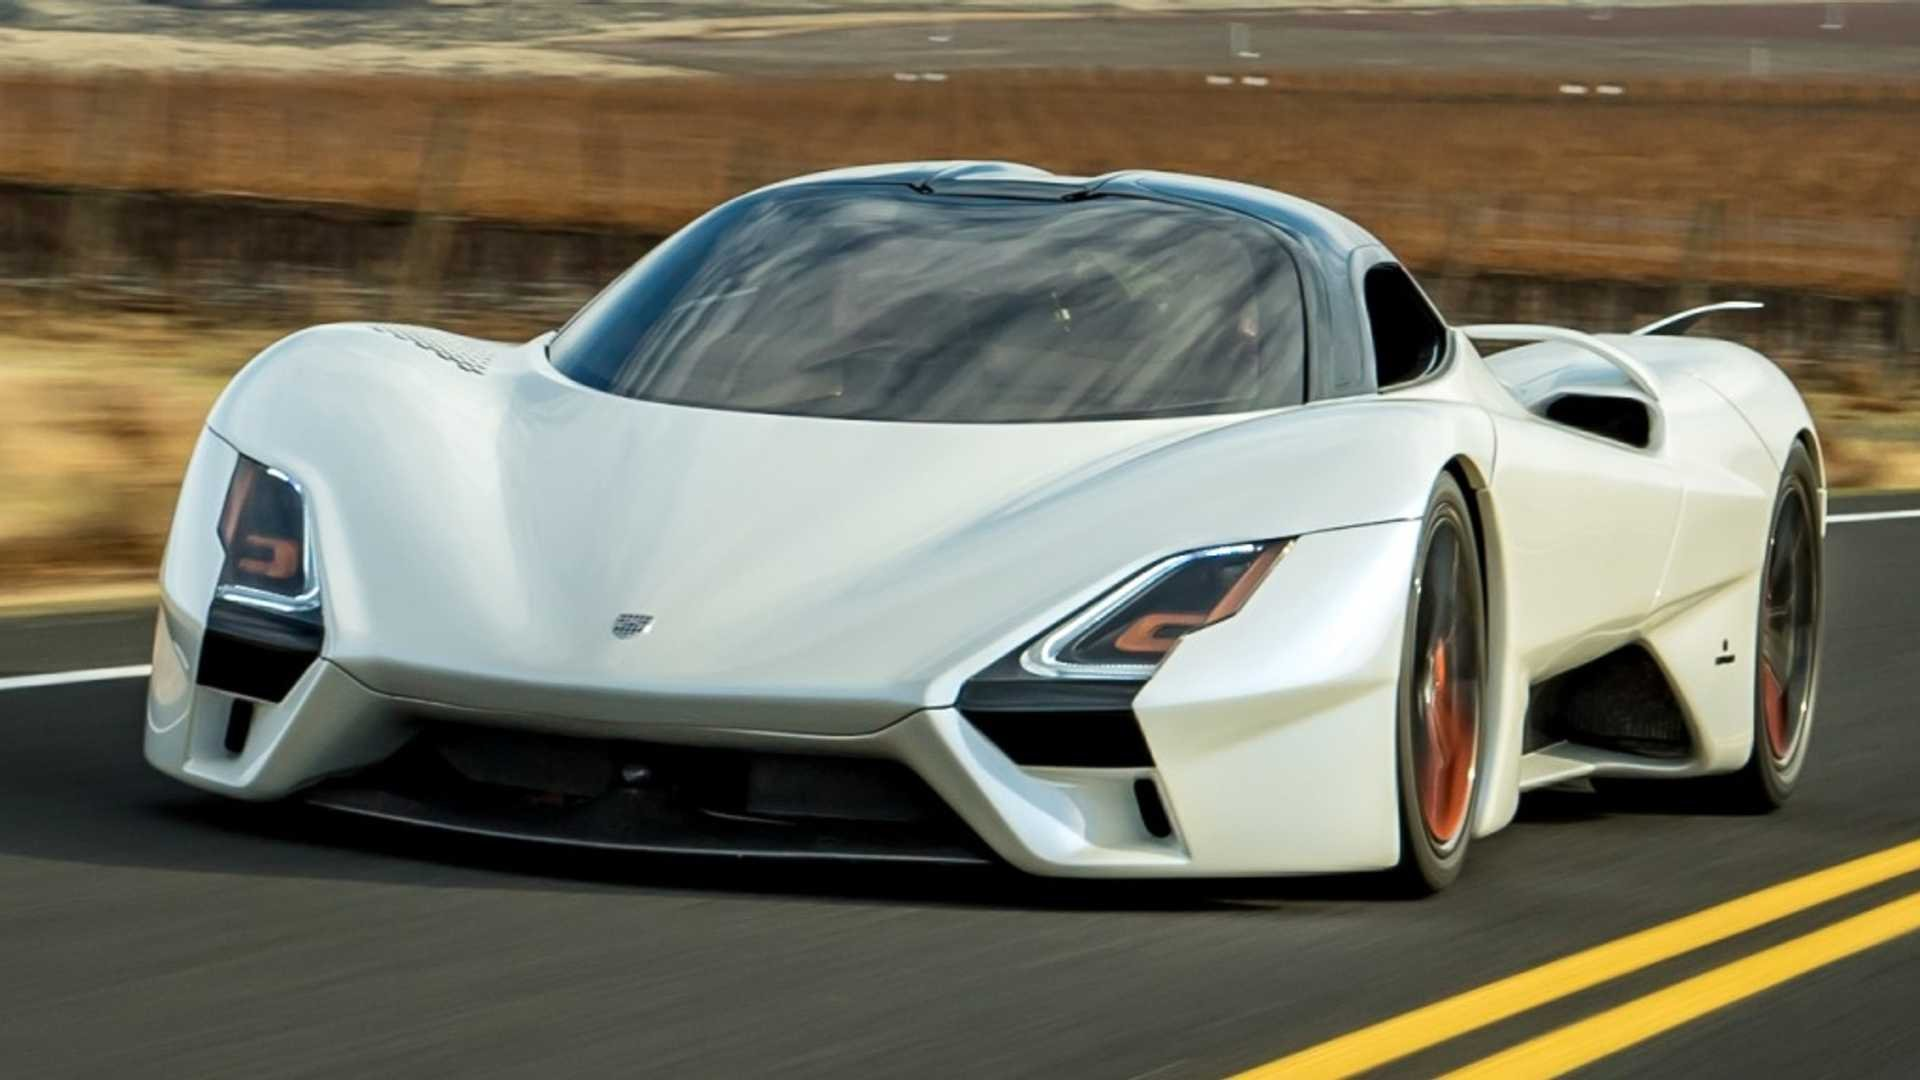 Local News Confirms SSC Has Broken Bugatti's 304-MPH Top Speed Record